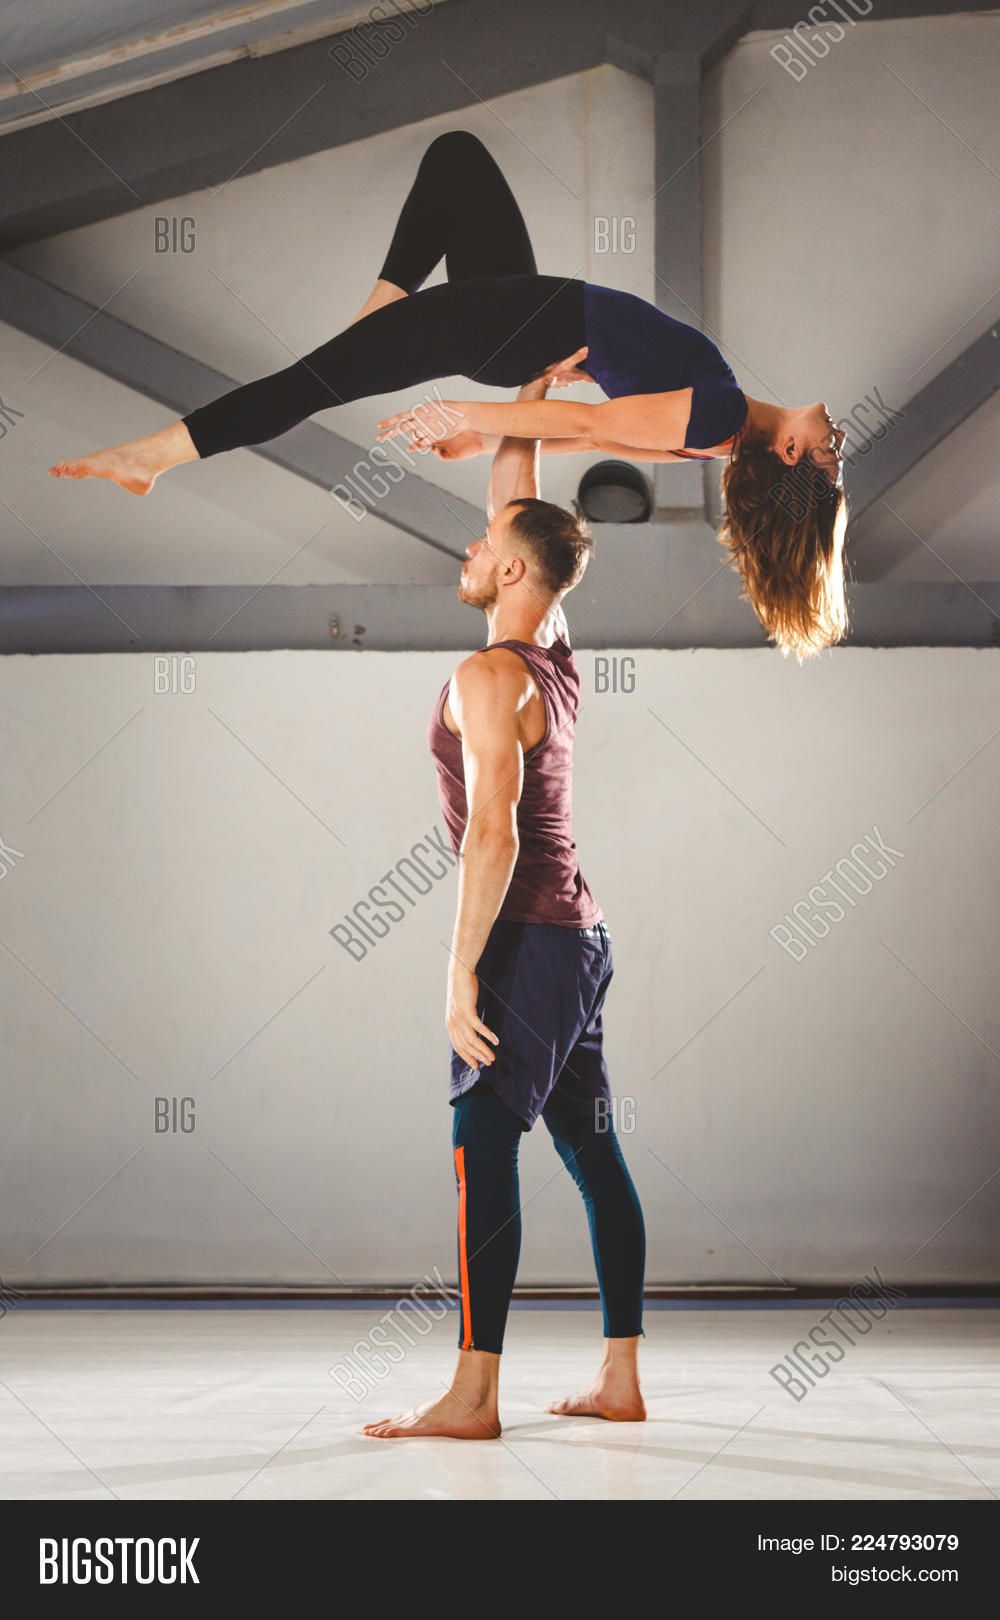 Theme Acroyoga Yoga Image Photo Free Trial Bigstock